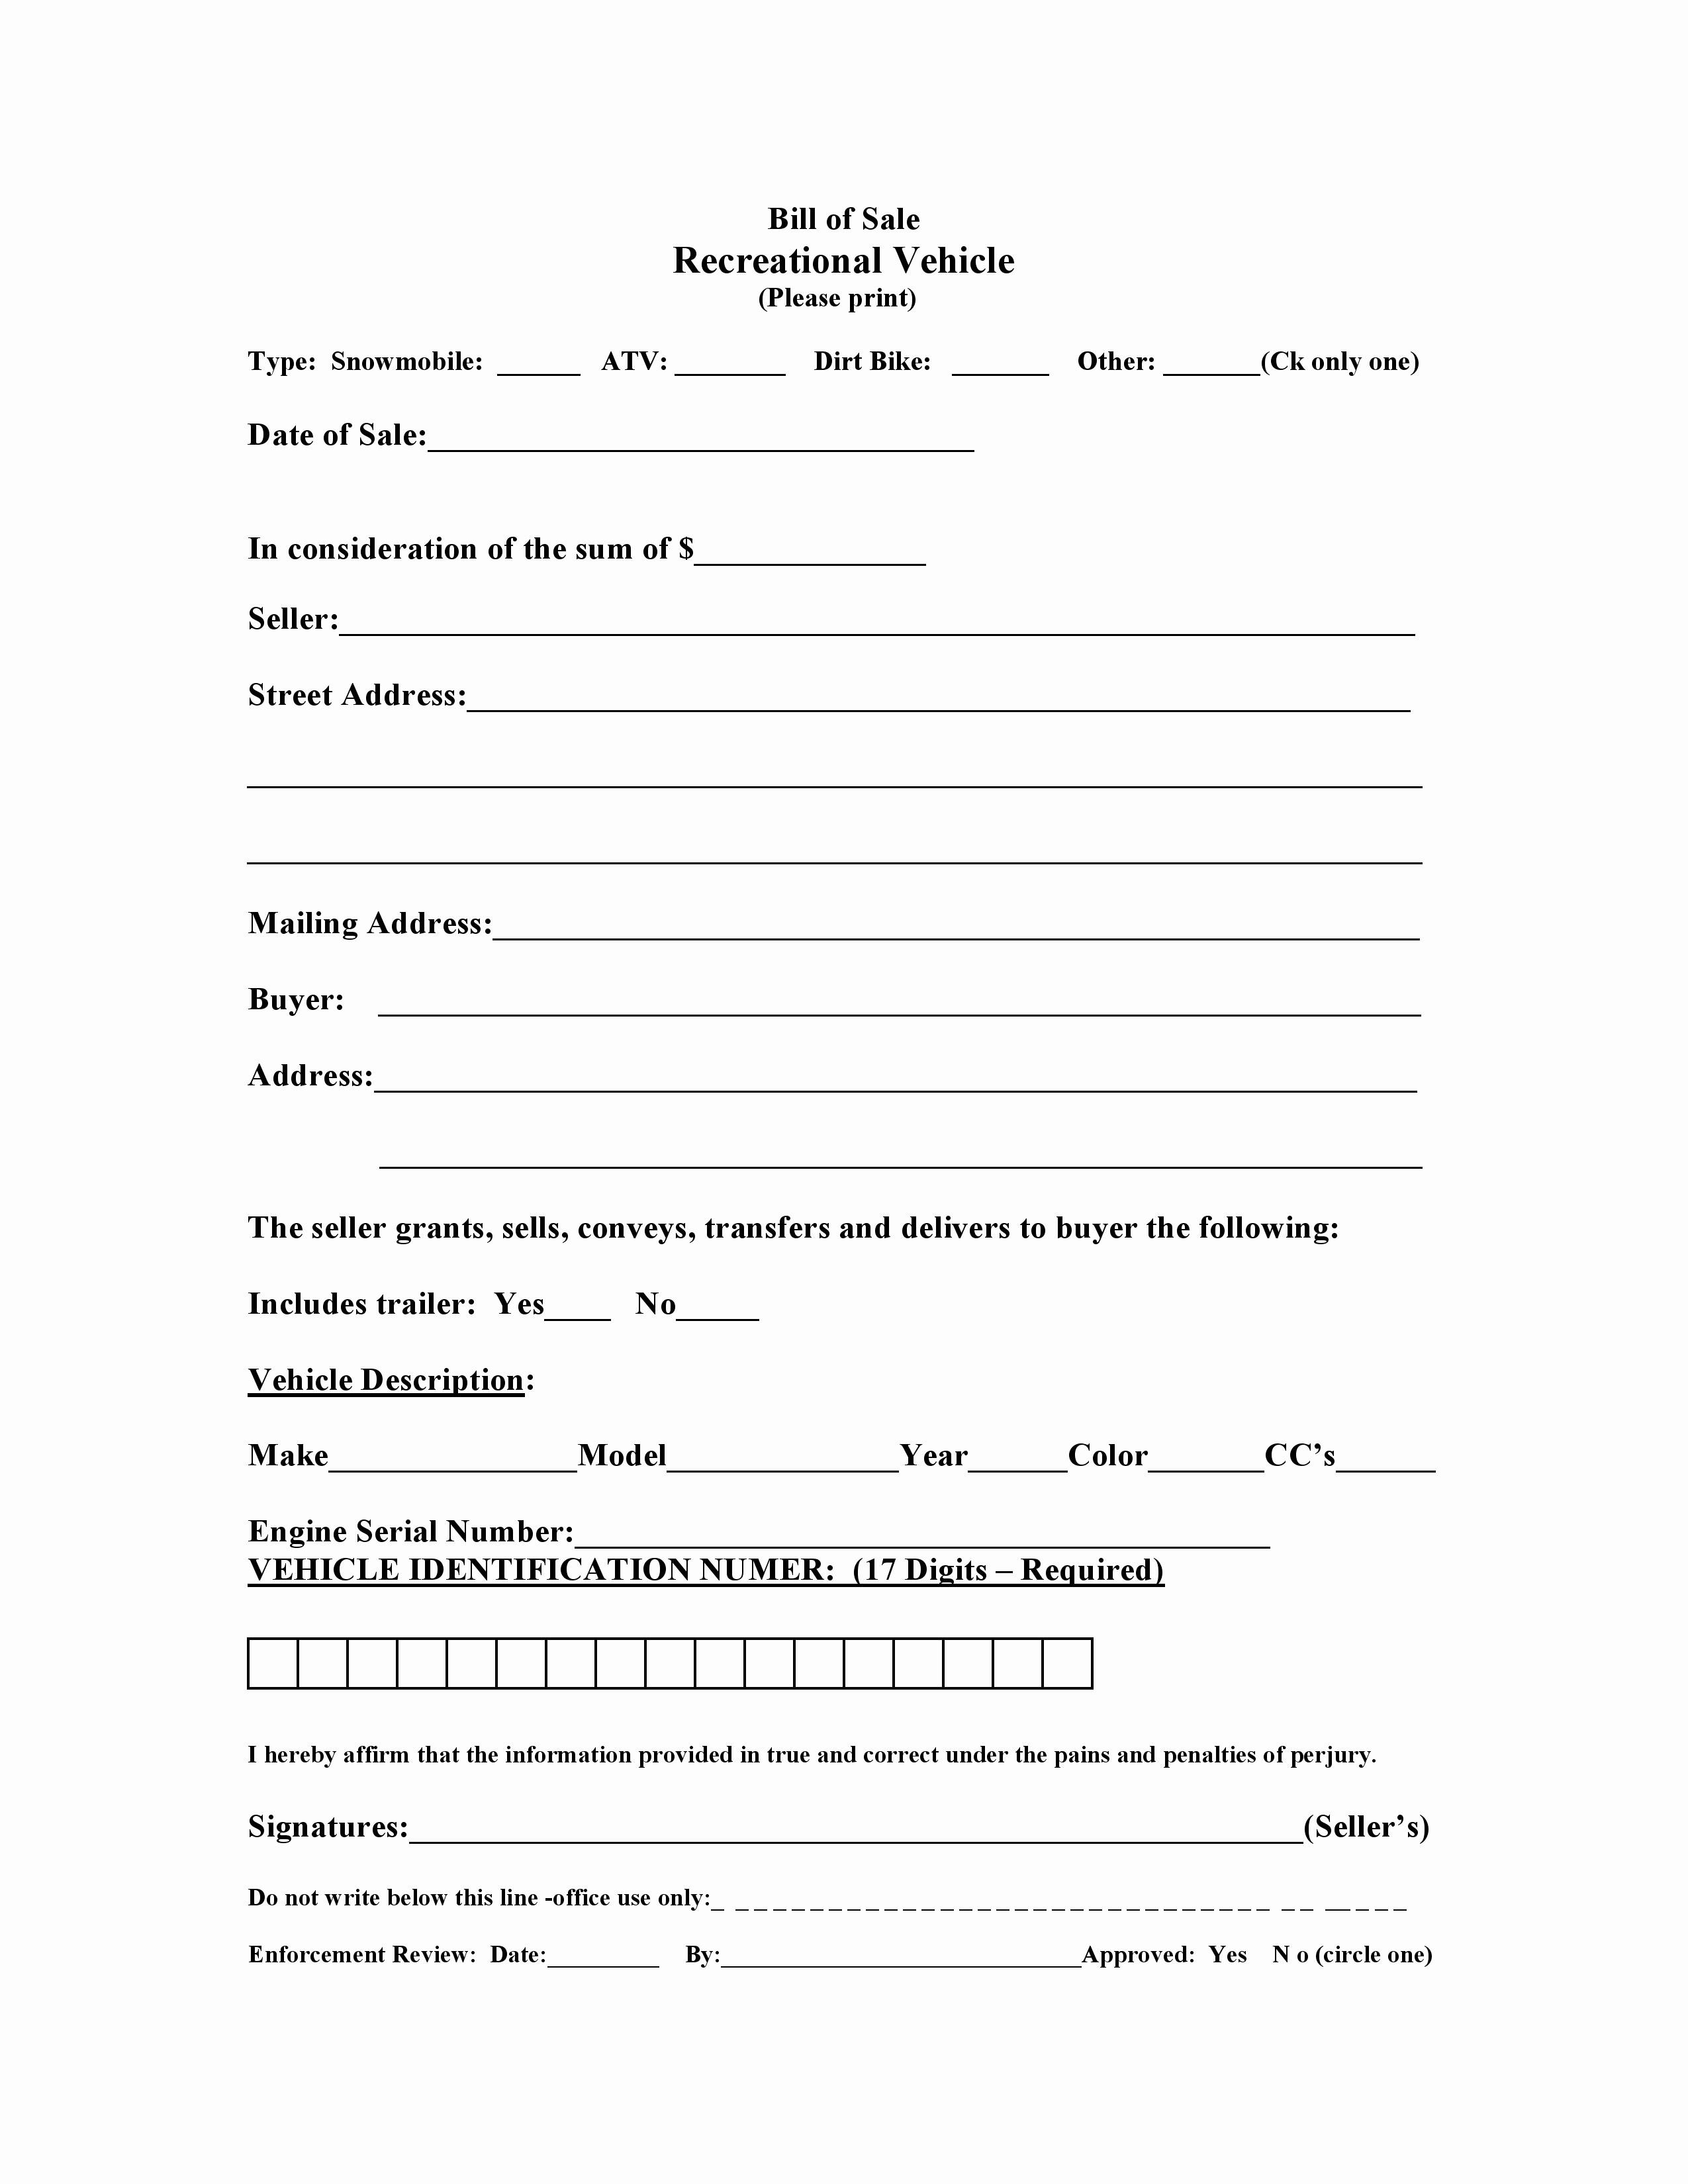 Ma Automobile Bill Of Sale Elegant Free Massachusetts Recreational Vessel Vehicle Bill Of